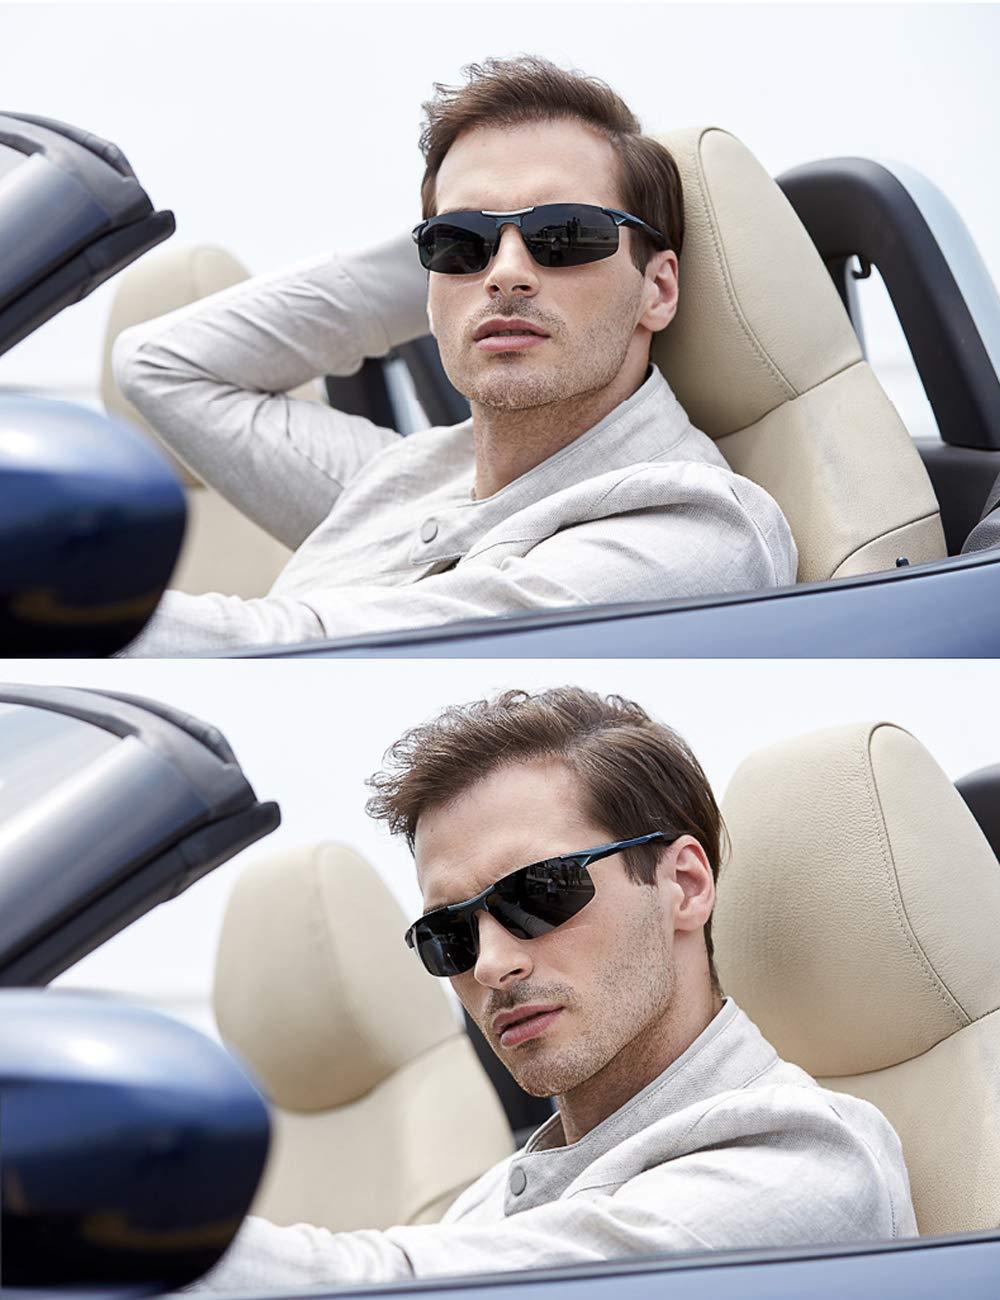 130fec82ac0 MOORAY Mens Sports Polarized Sunglasses UV Protection Fashion Sunglasses  for Men Fishing Driving(Black